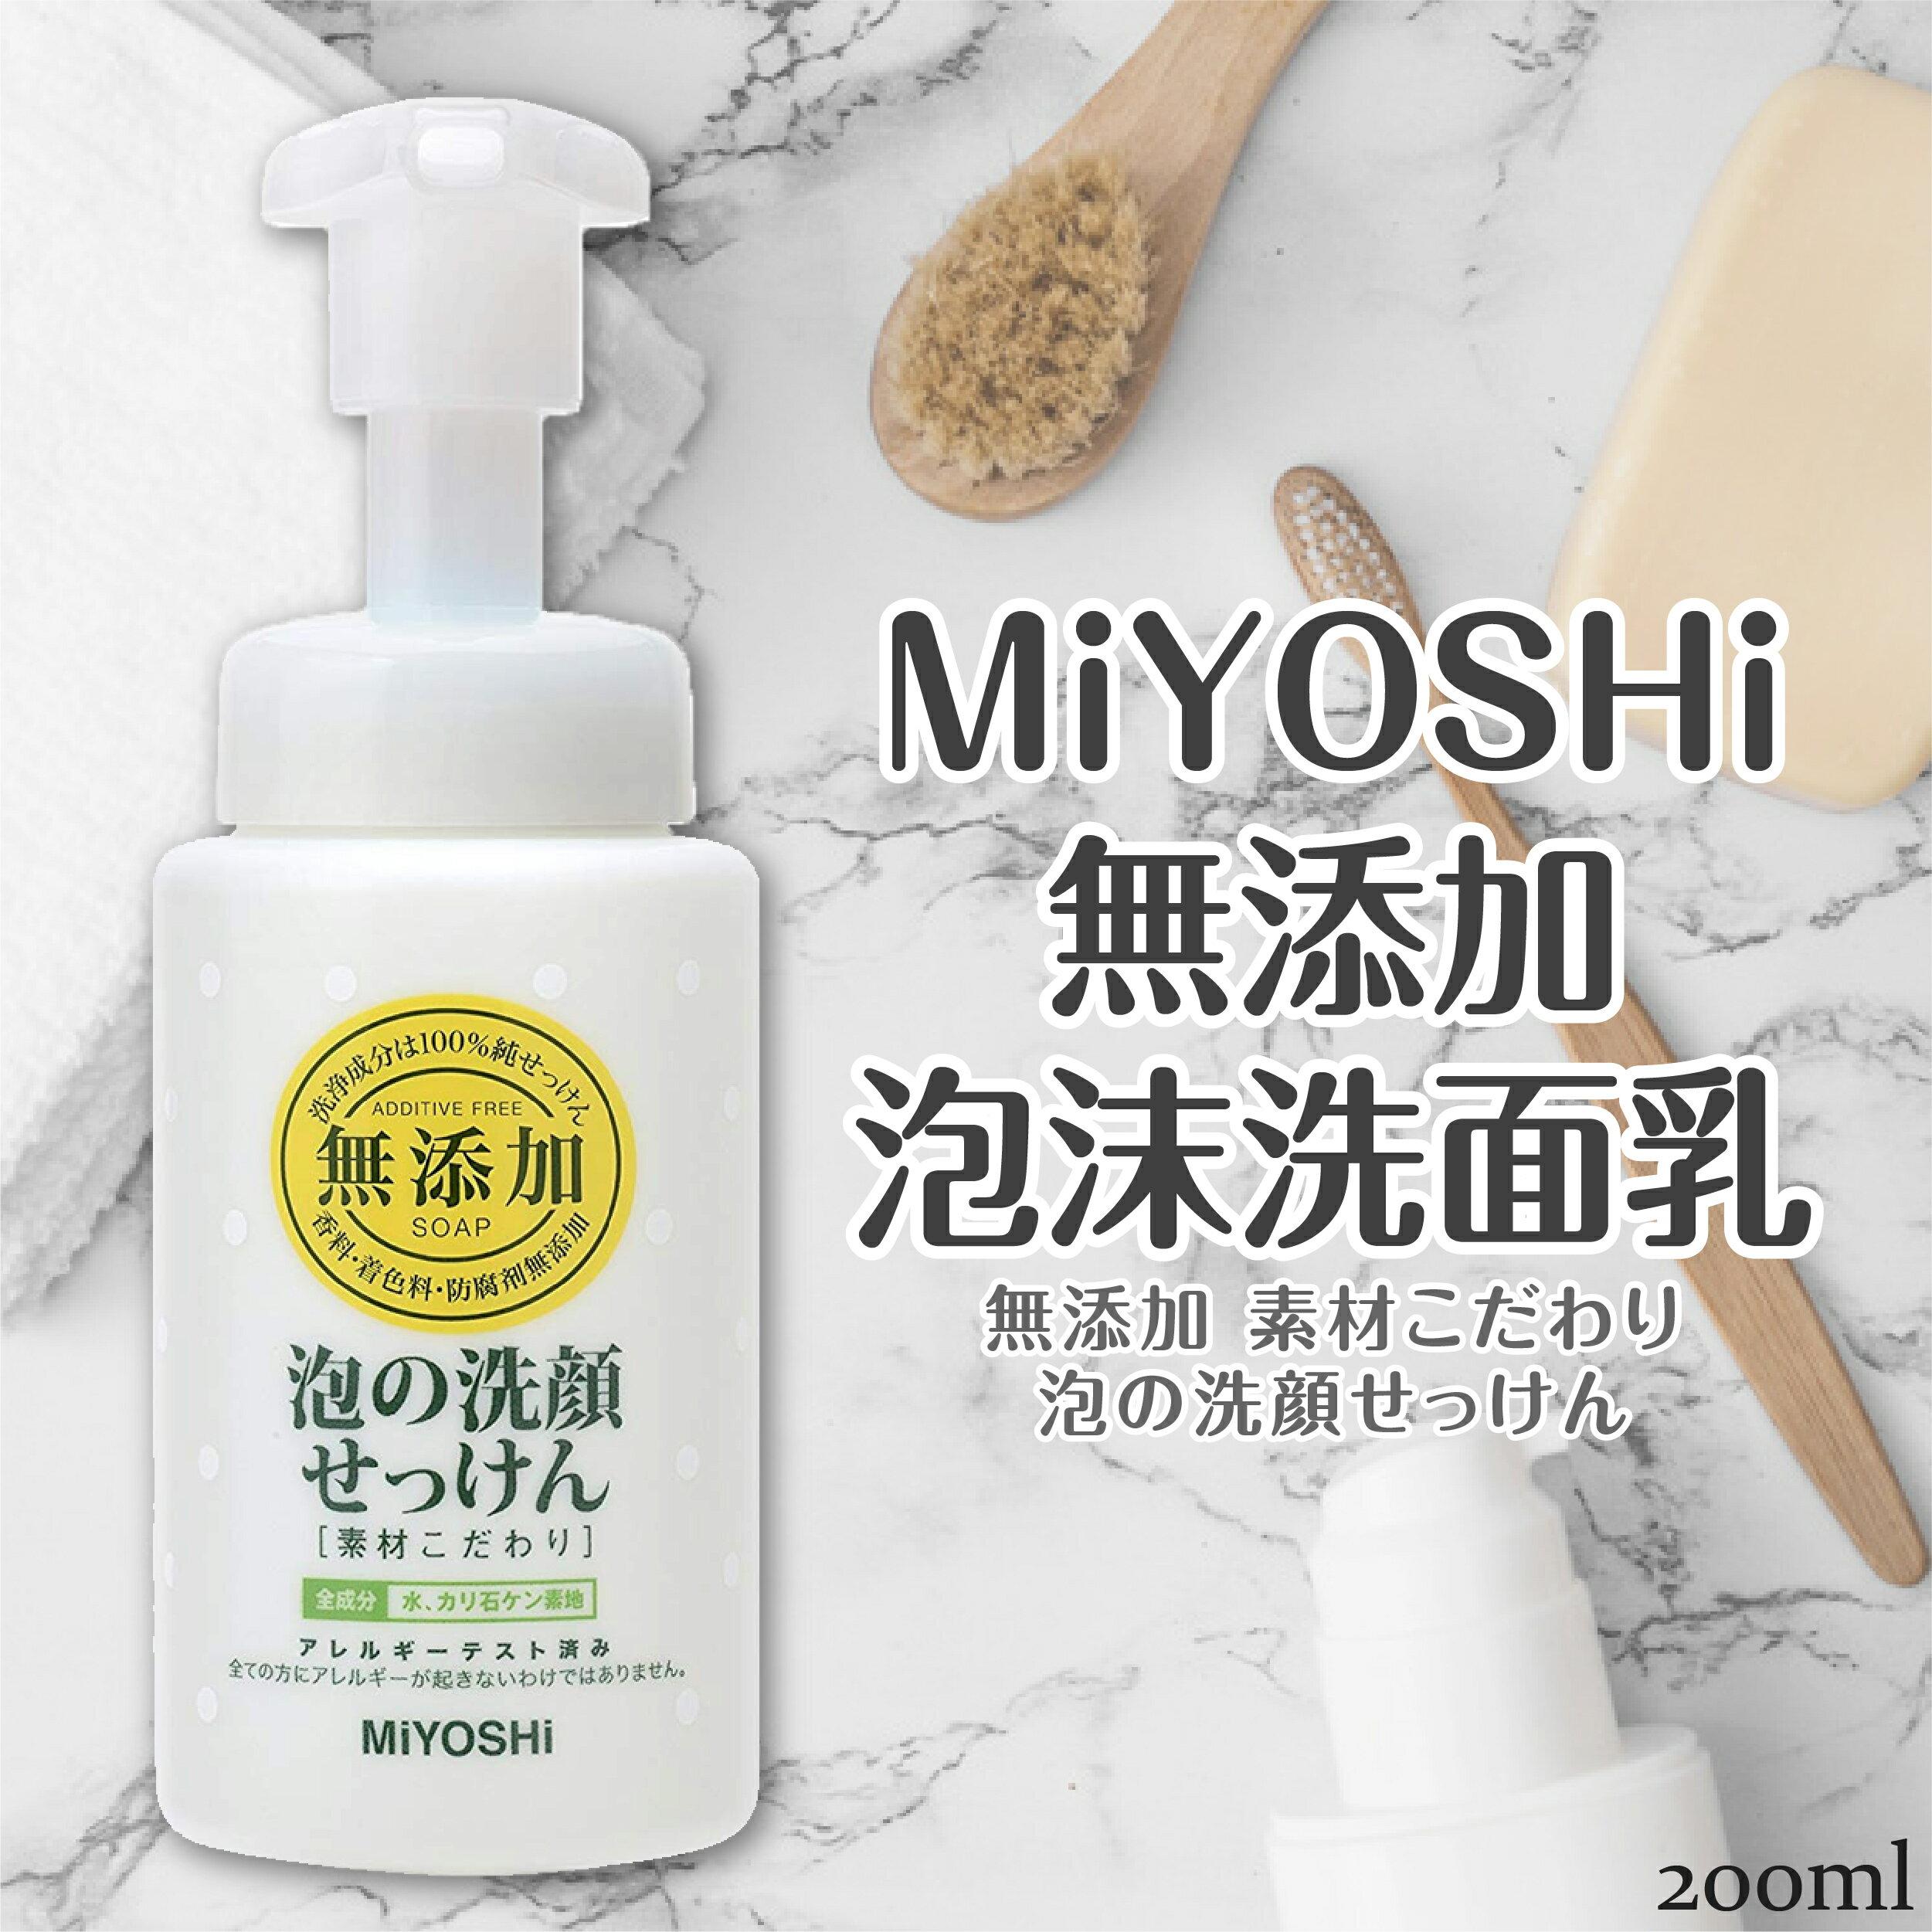 family2日本生活精品館 日本品牌【MiYOSHi】無添加泡沫洗面乳 200ml